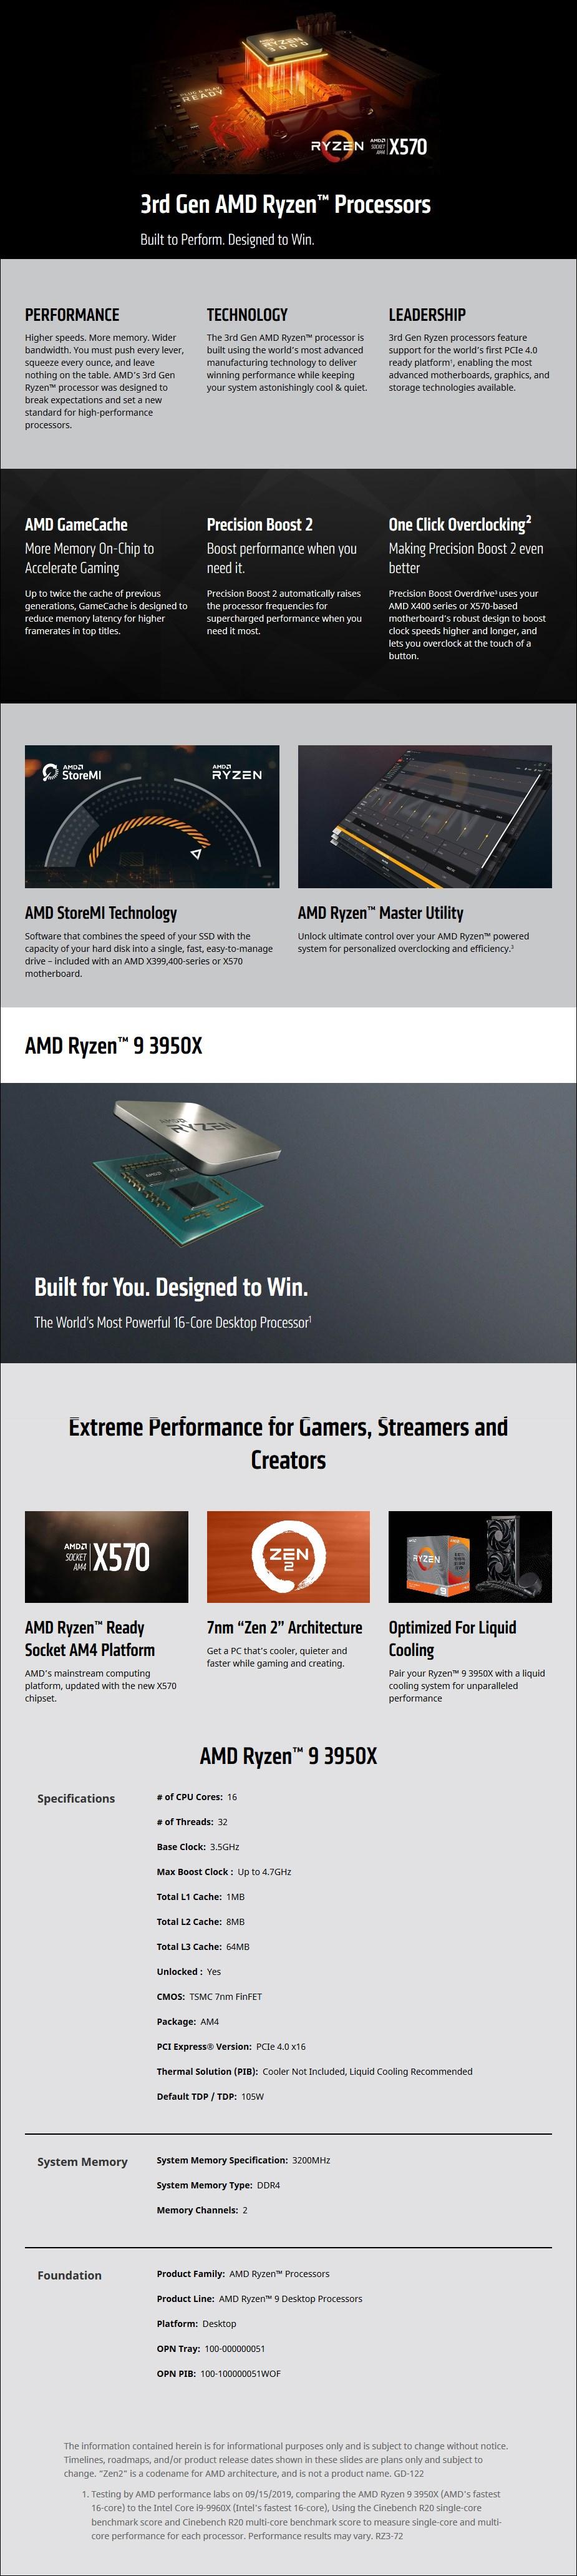 amd-ryzen-9-3950x-16core-am4-350-ghz-unlocked-cpu-processor-ac29613-5.jpg